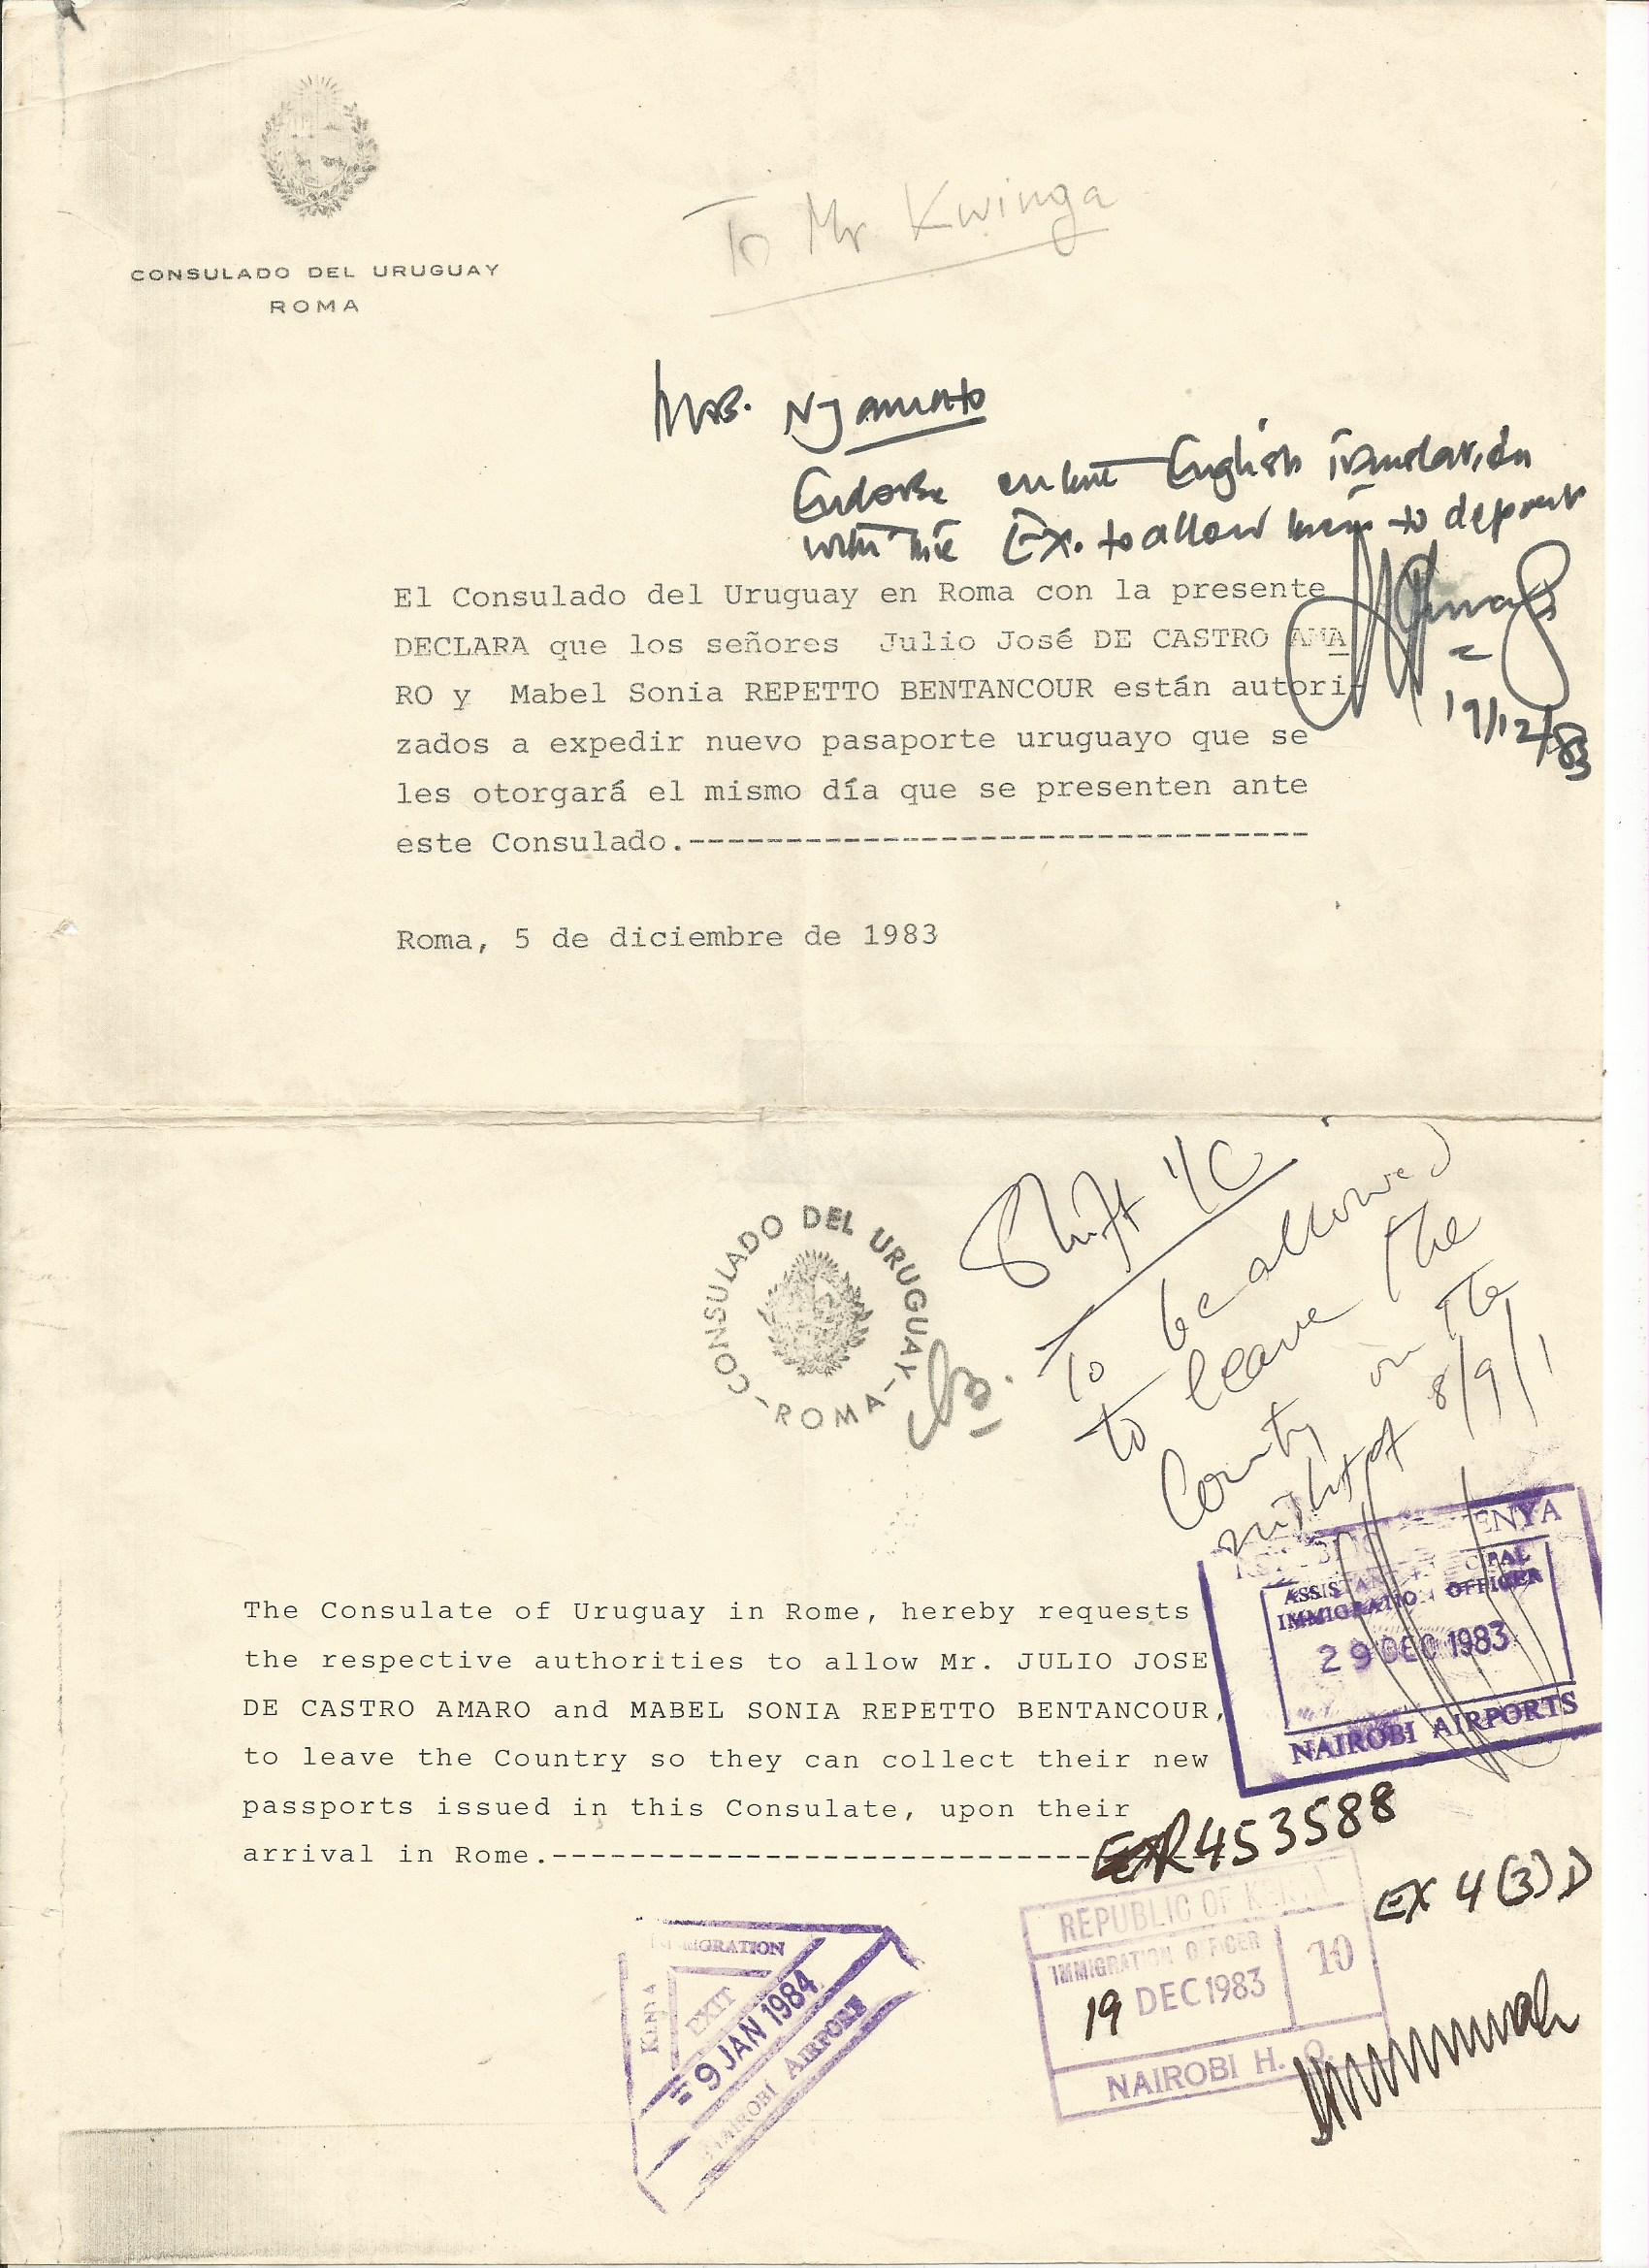 Kenya passport copy